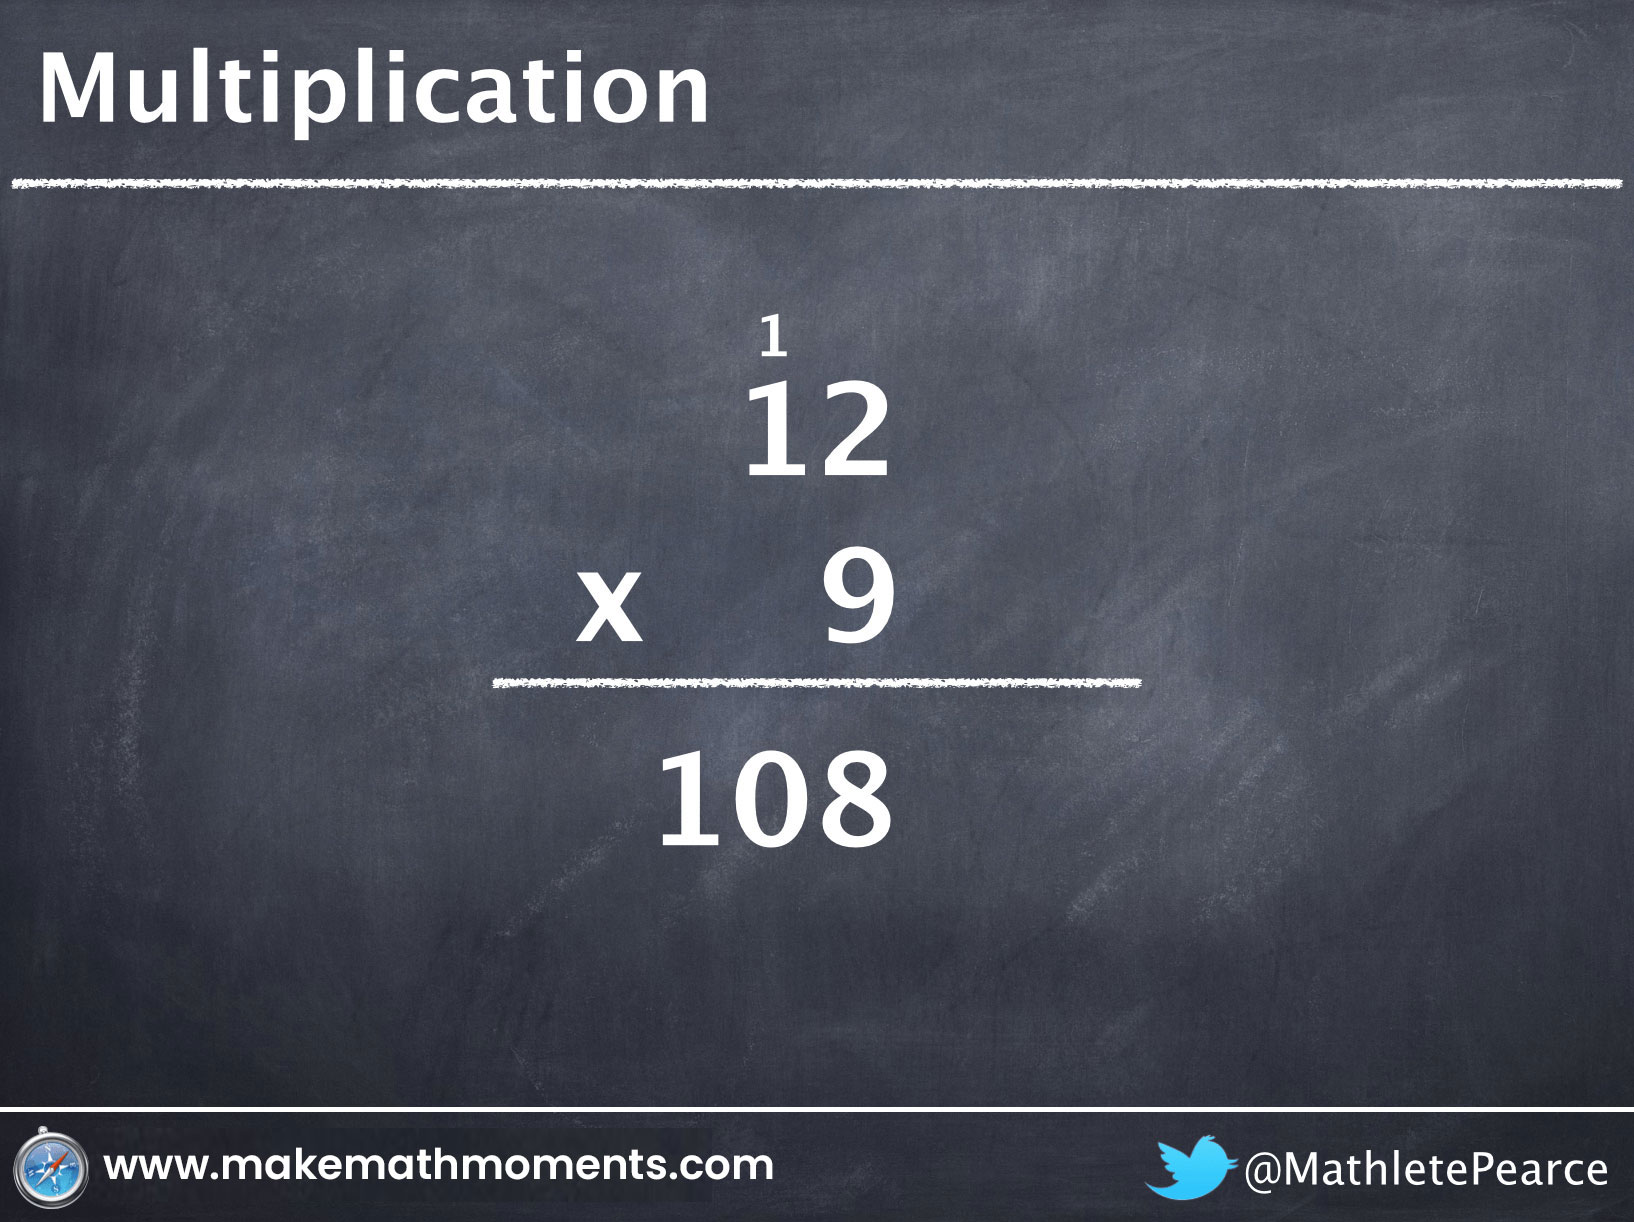 North American Multiplication Algorithm 12 x 9 = 108